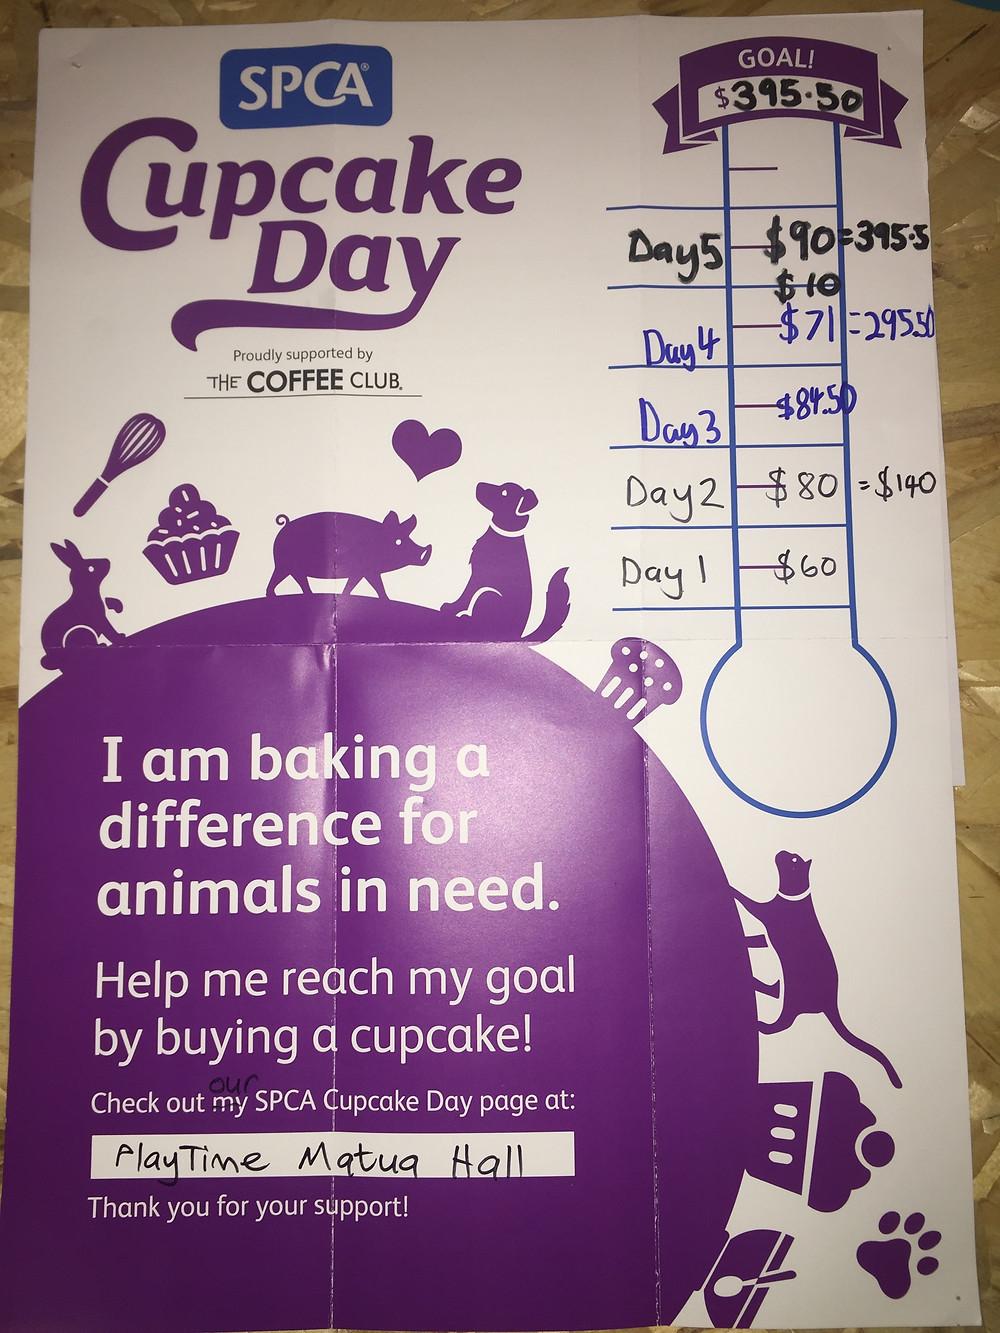 PlayTime Matua Hall - SPCA Cupcake Day